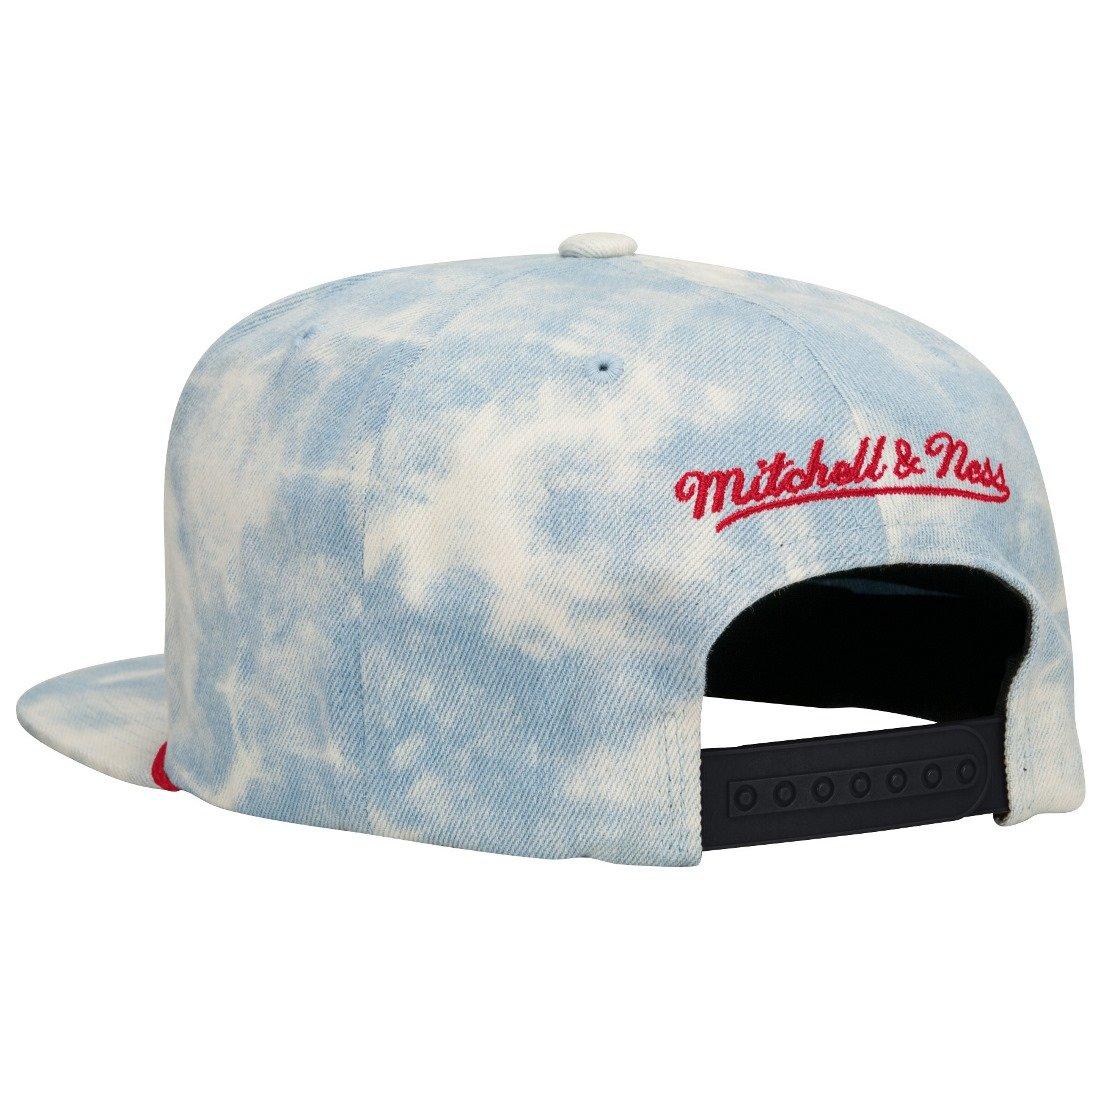 brand new d3ba2 54e18 Amazon.com  Brooklyn Nets Acid Wash Denim Snapback Hat  Clothing